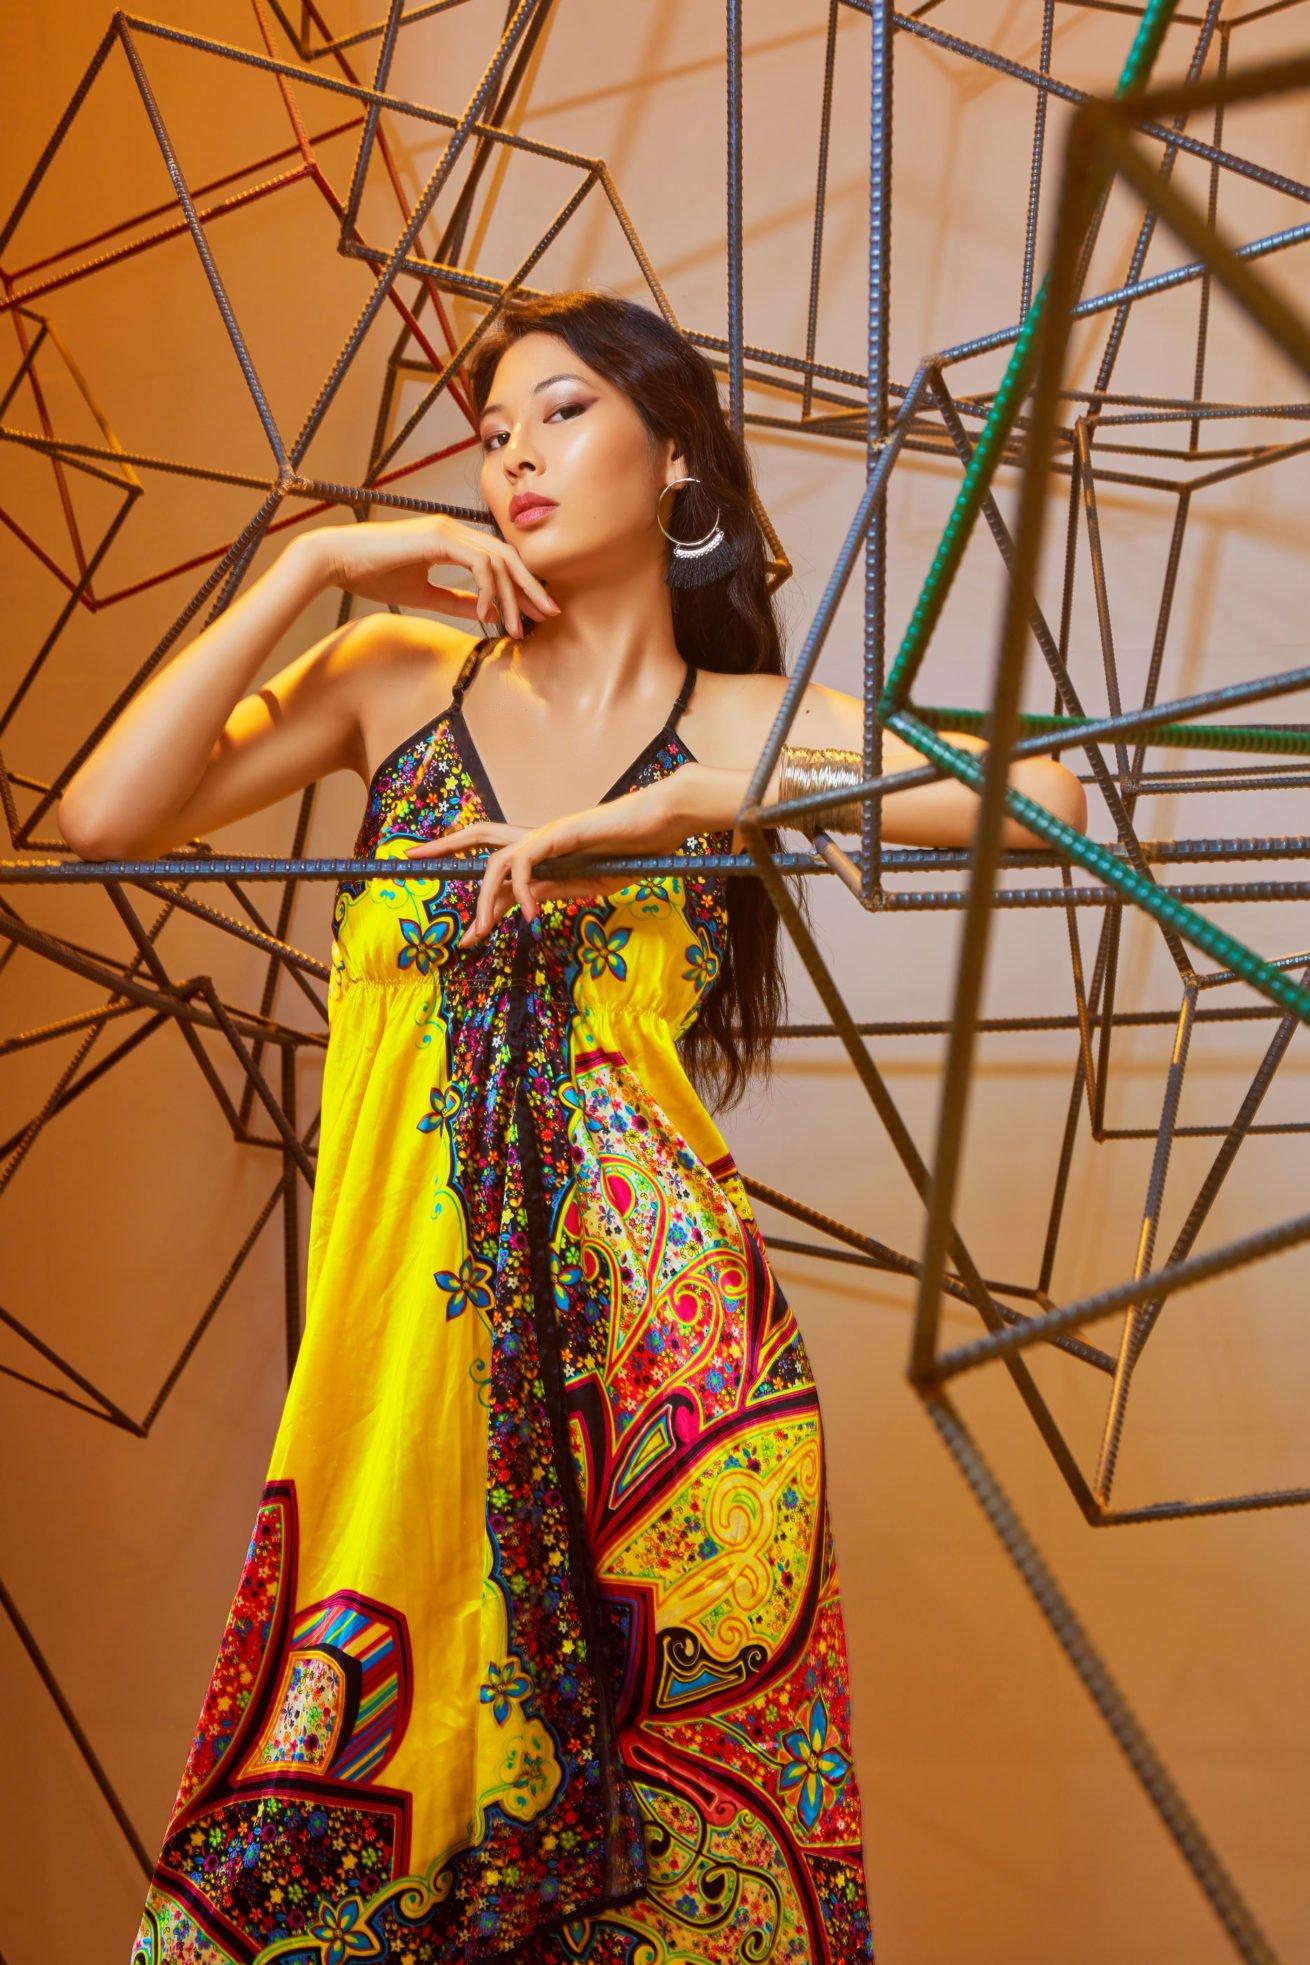 _M5L1150-Shiseido-Girl-WEB1